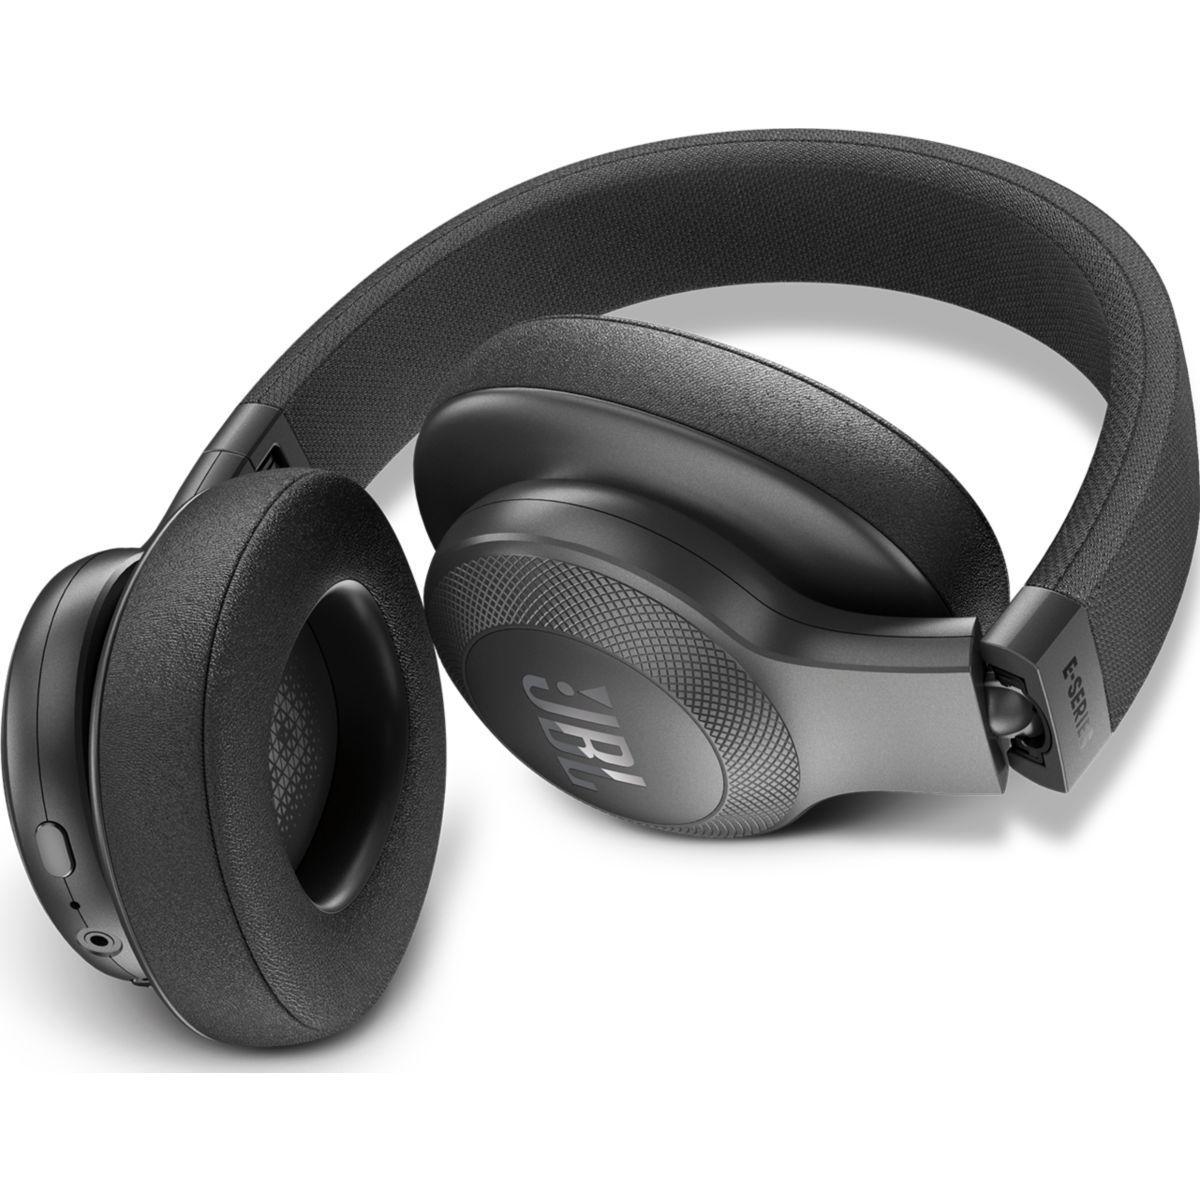 Cascos     Bluetooth  Micrófono Jbl E55BT - Negro